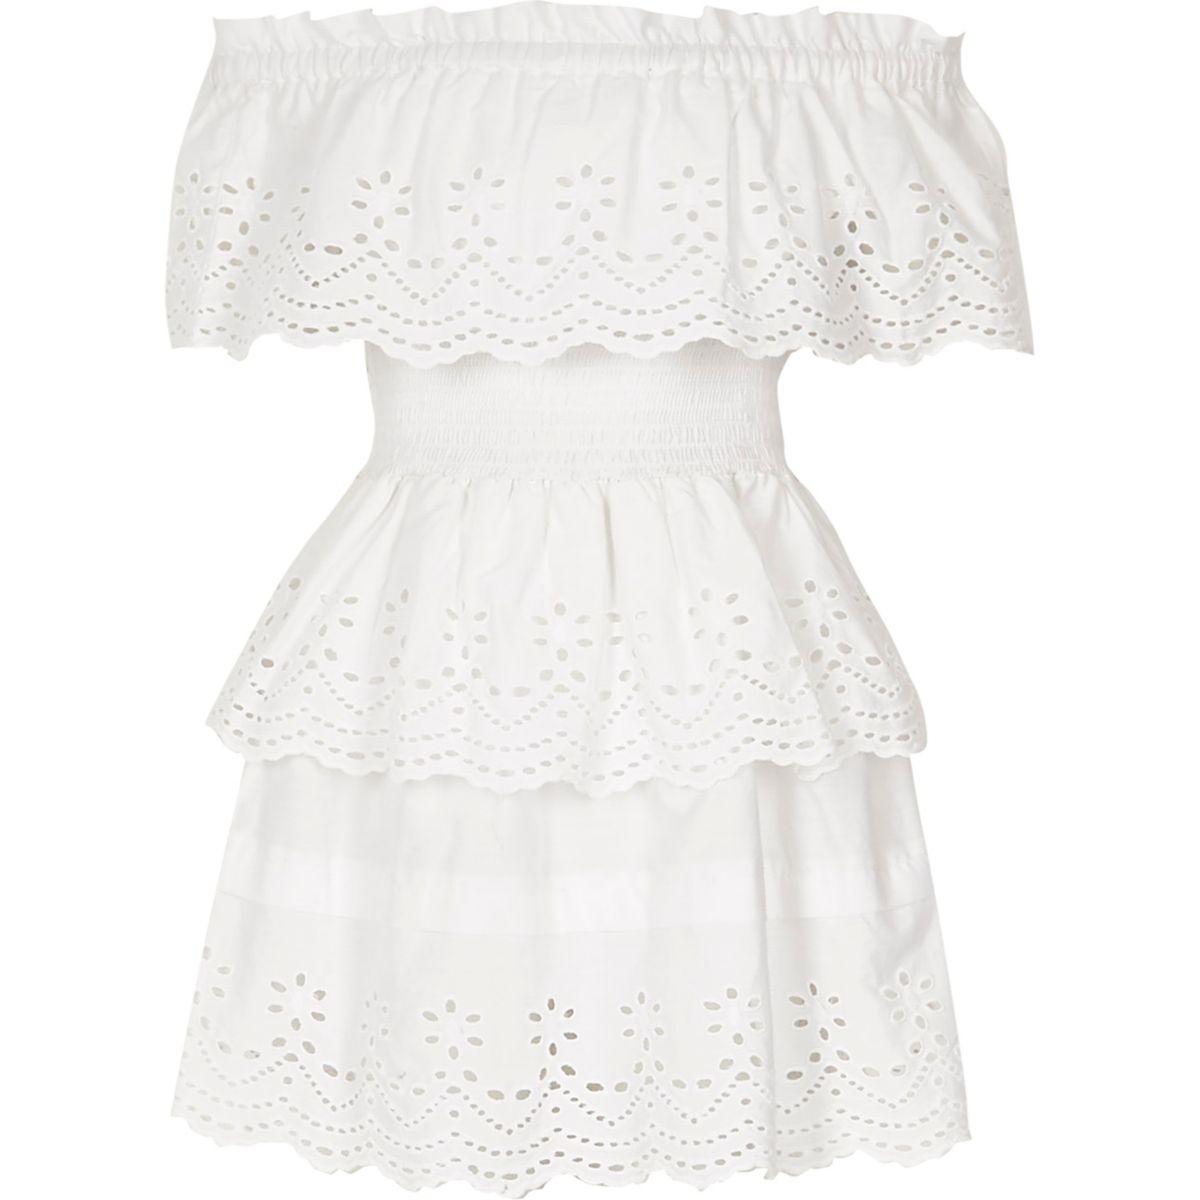 Robe Bardot Rara blanche à volants avec broderie pour fille